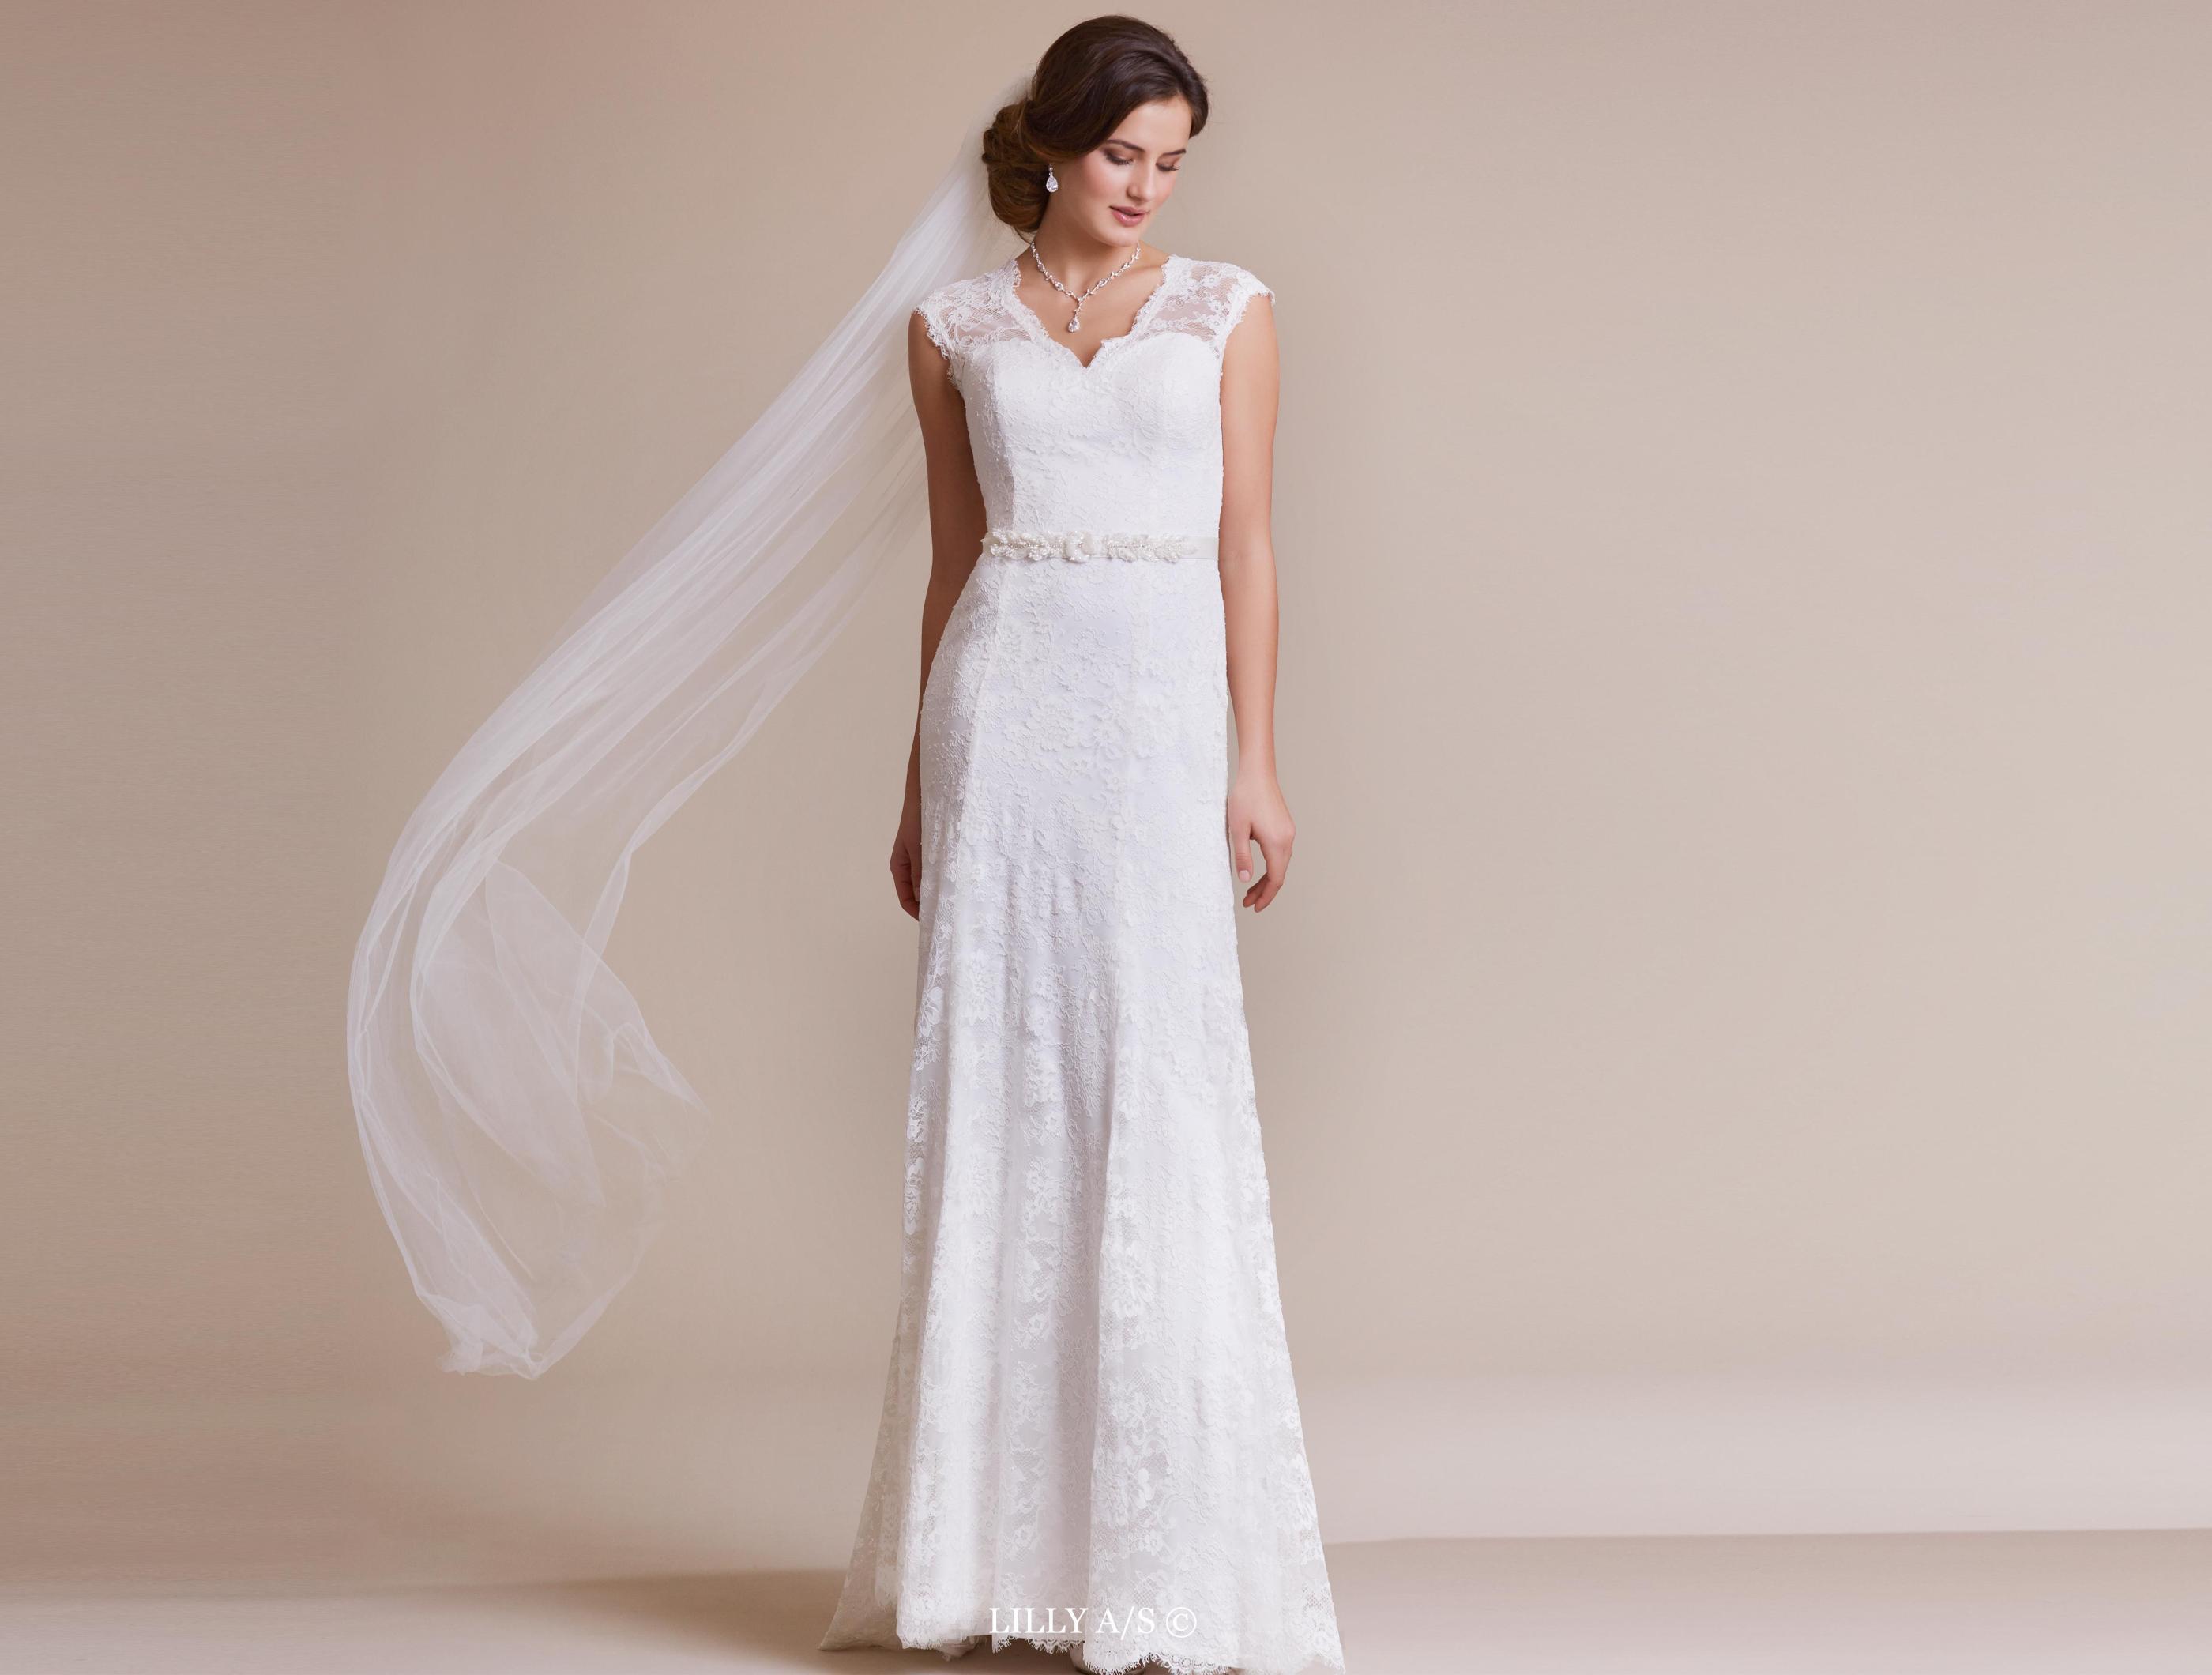 Lace Silhouette Dress